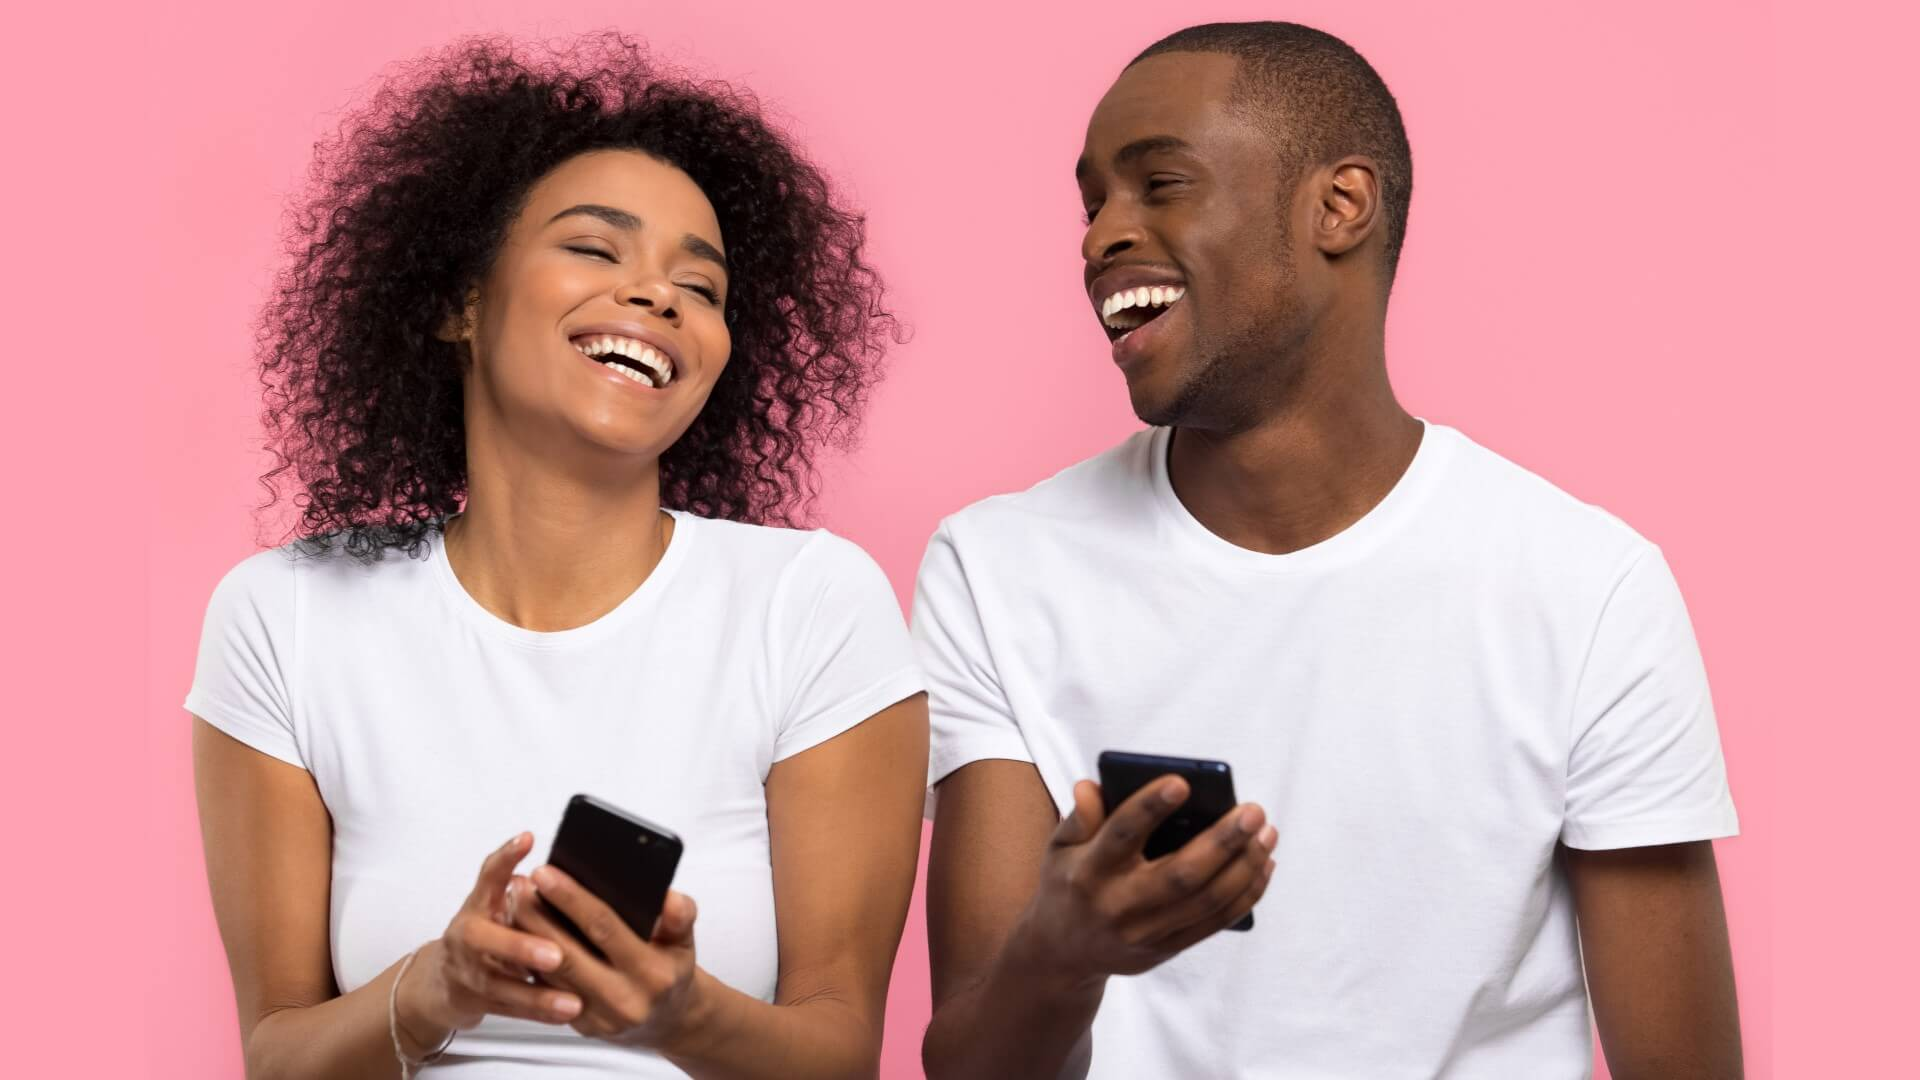 Ich beende dating-apps